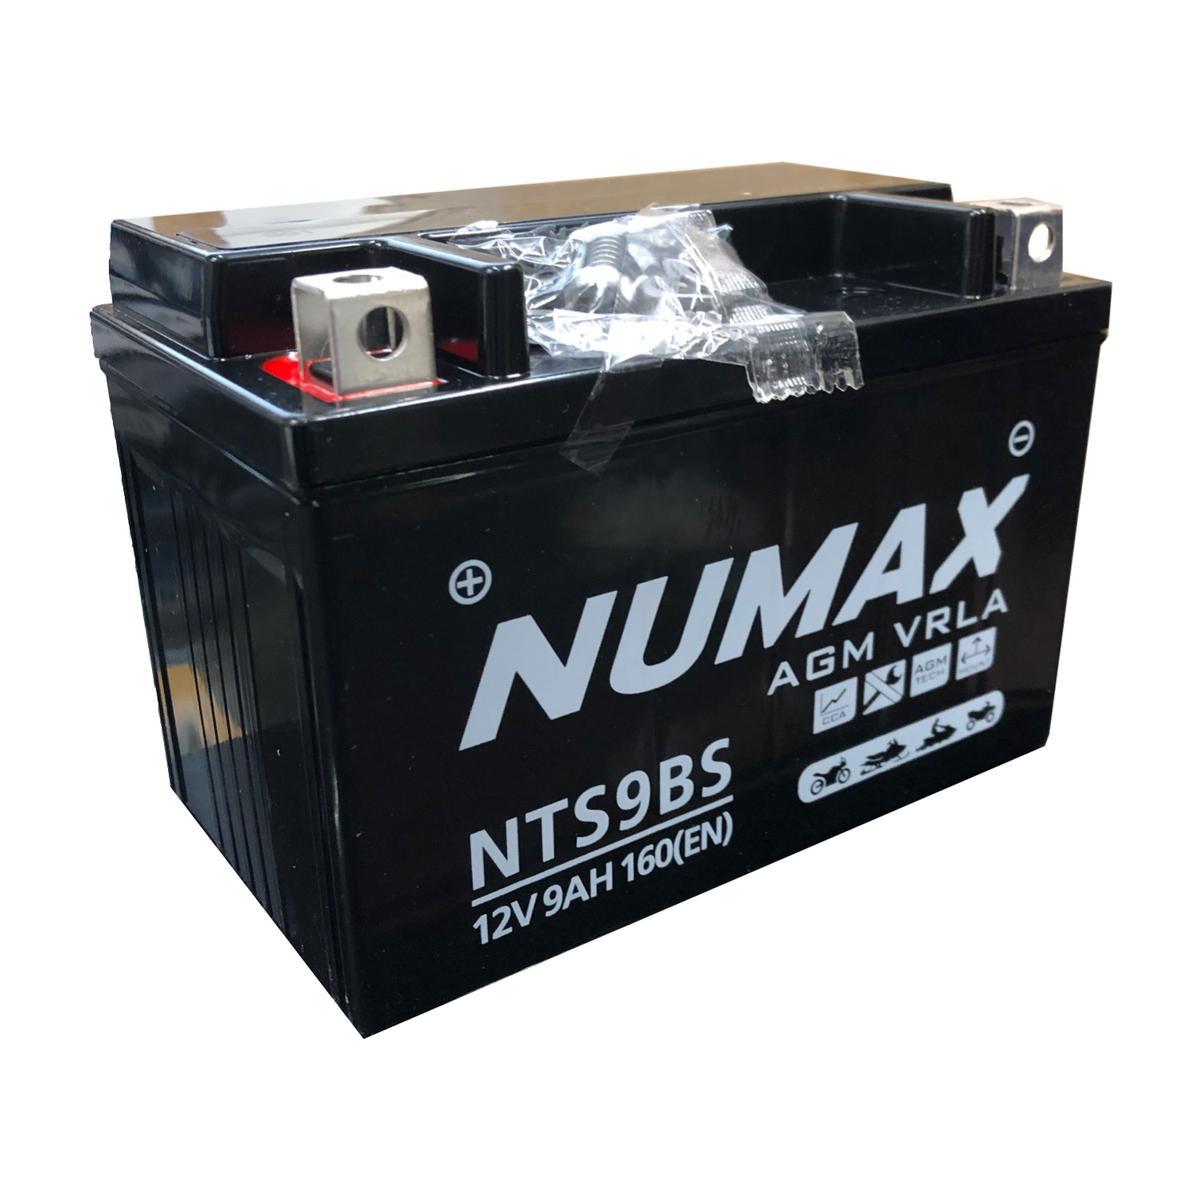 Numax NTS9BS 12v Motorbike Bike Gel Liquifix Battery HONDA 500cc S YXT9-4